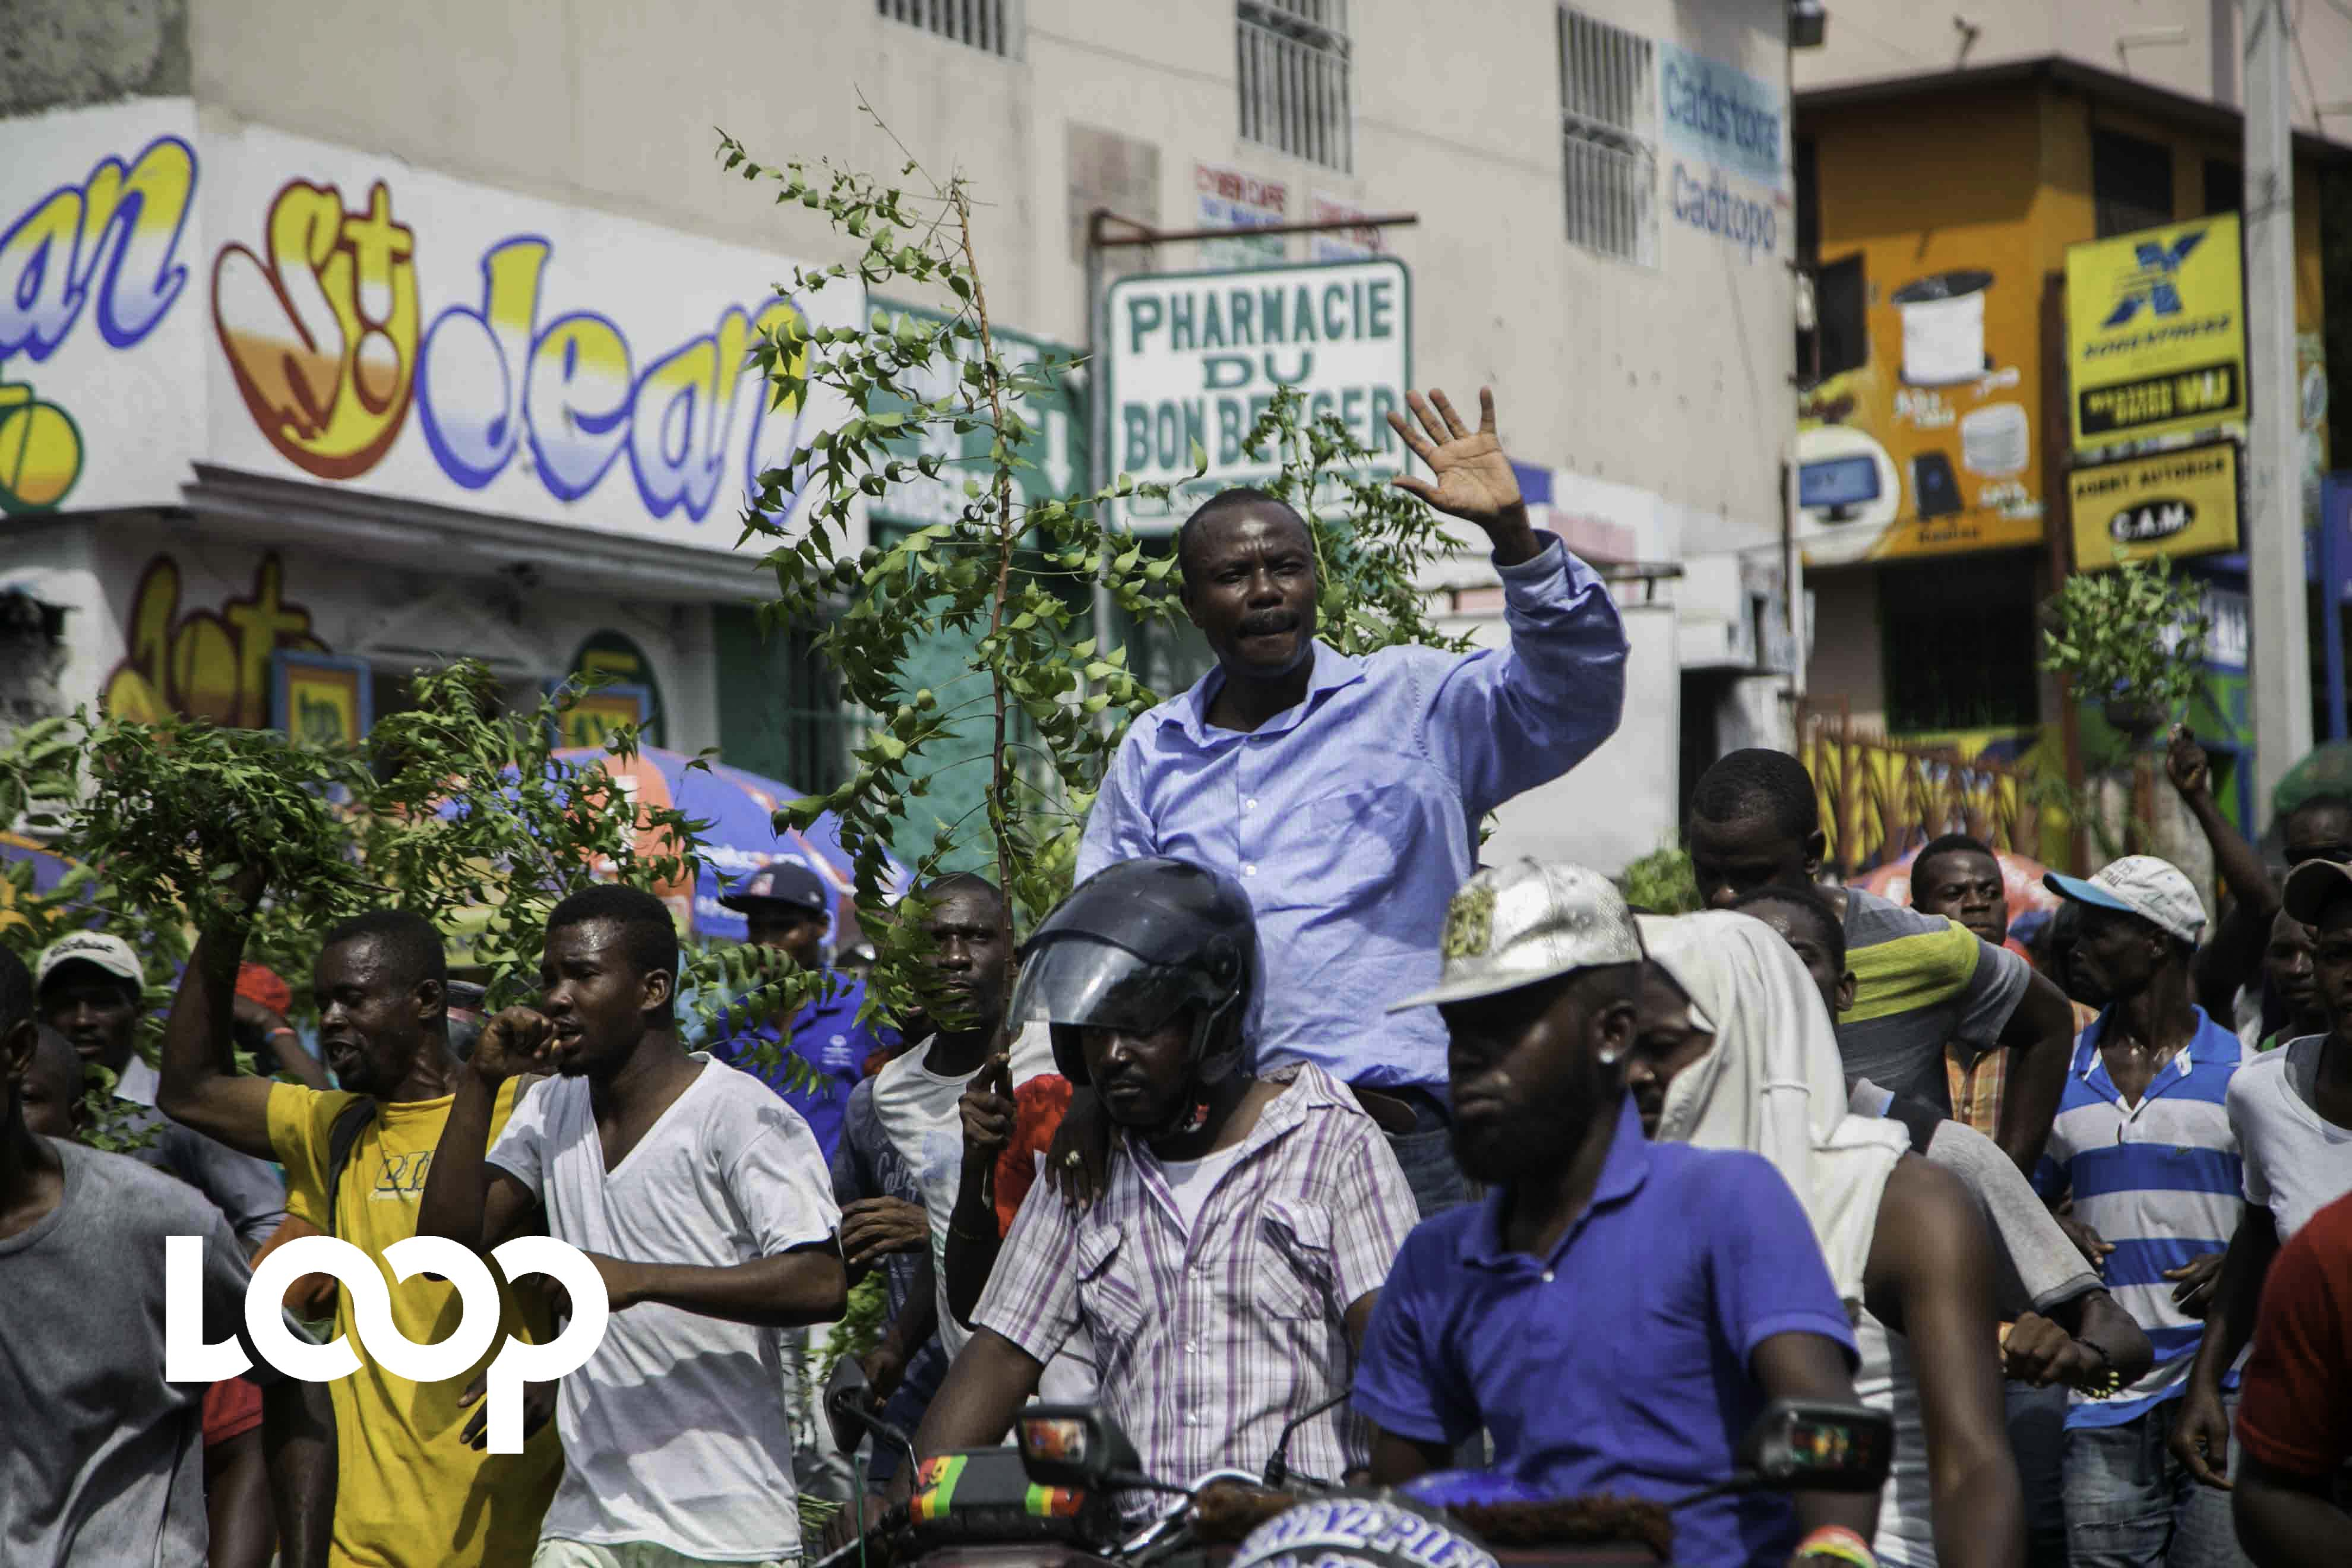 Moise Jean Charles lors d'une manifestation